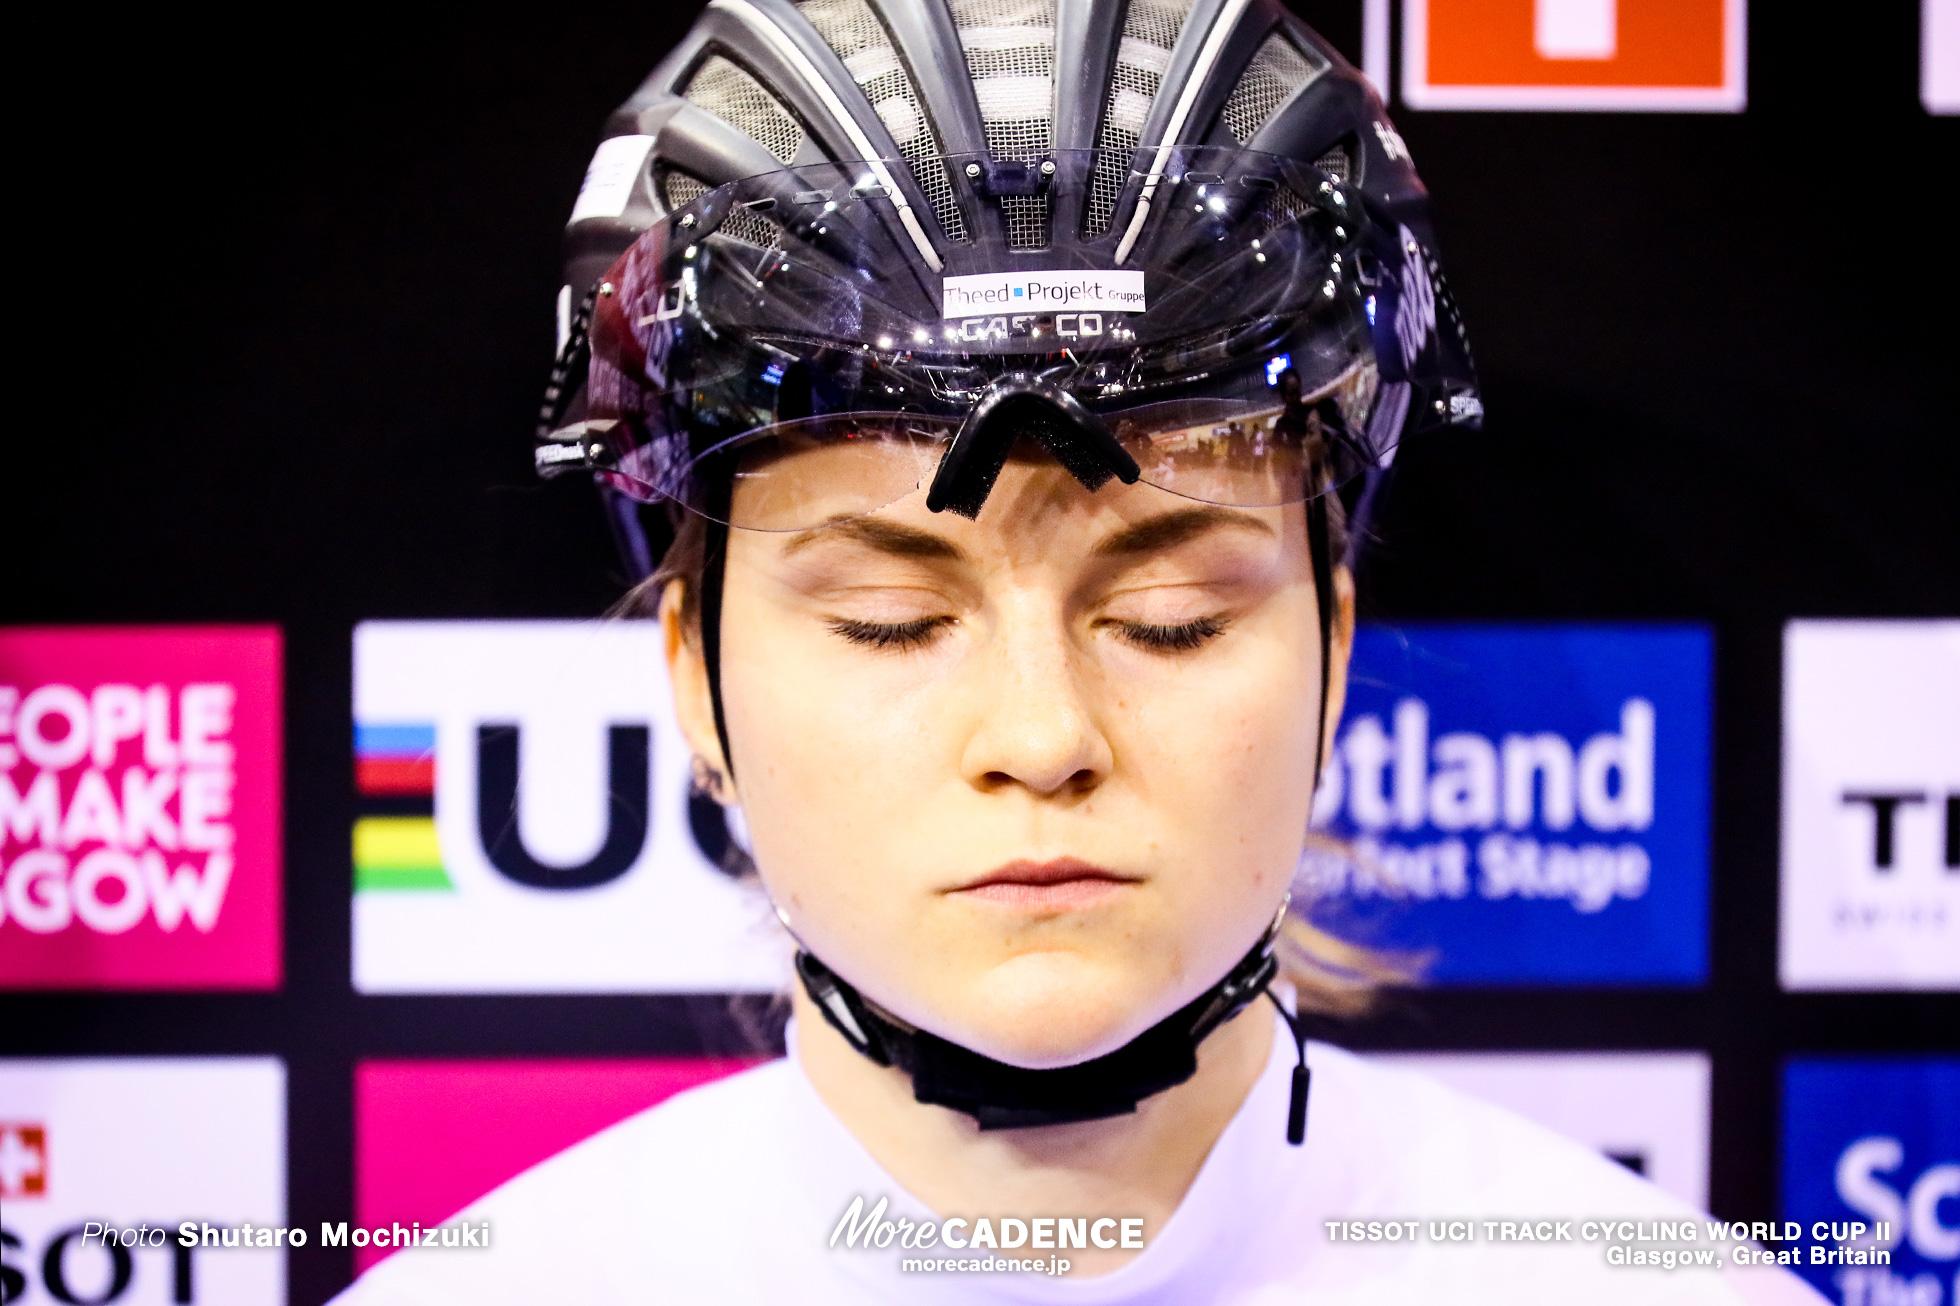 Final / Women's Sprint / TISSOT UCI TRACK CYCLING WORLD CUP II, Glasgow, Great Britain, FRIEDRICH Lea Sophie リー・ソフィー・フリードリッヒ